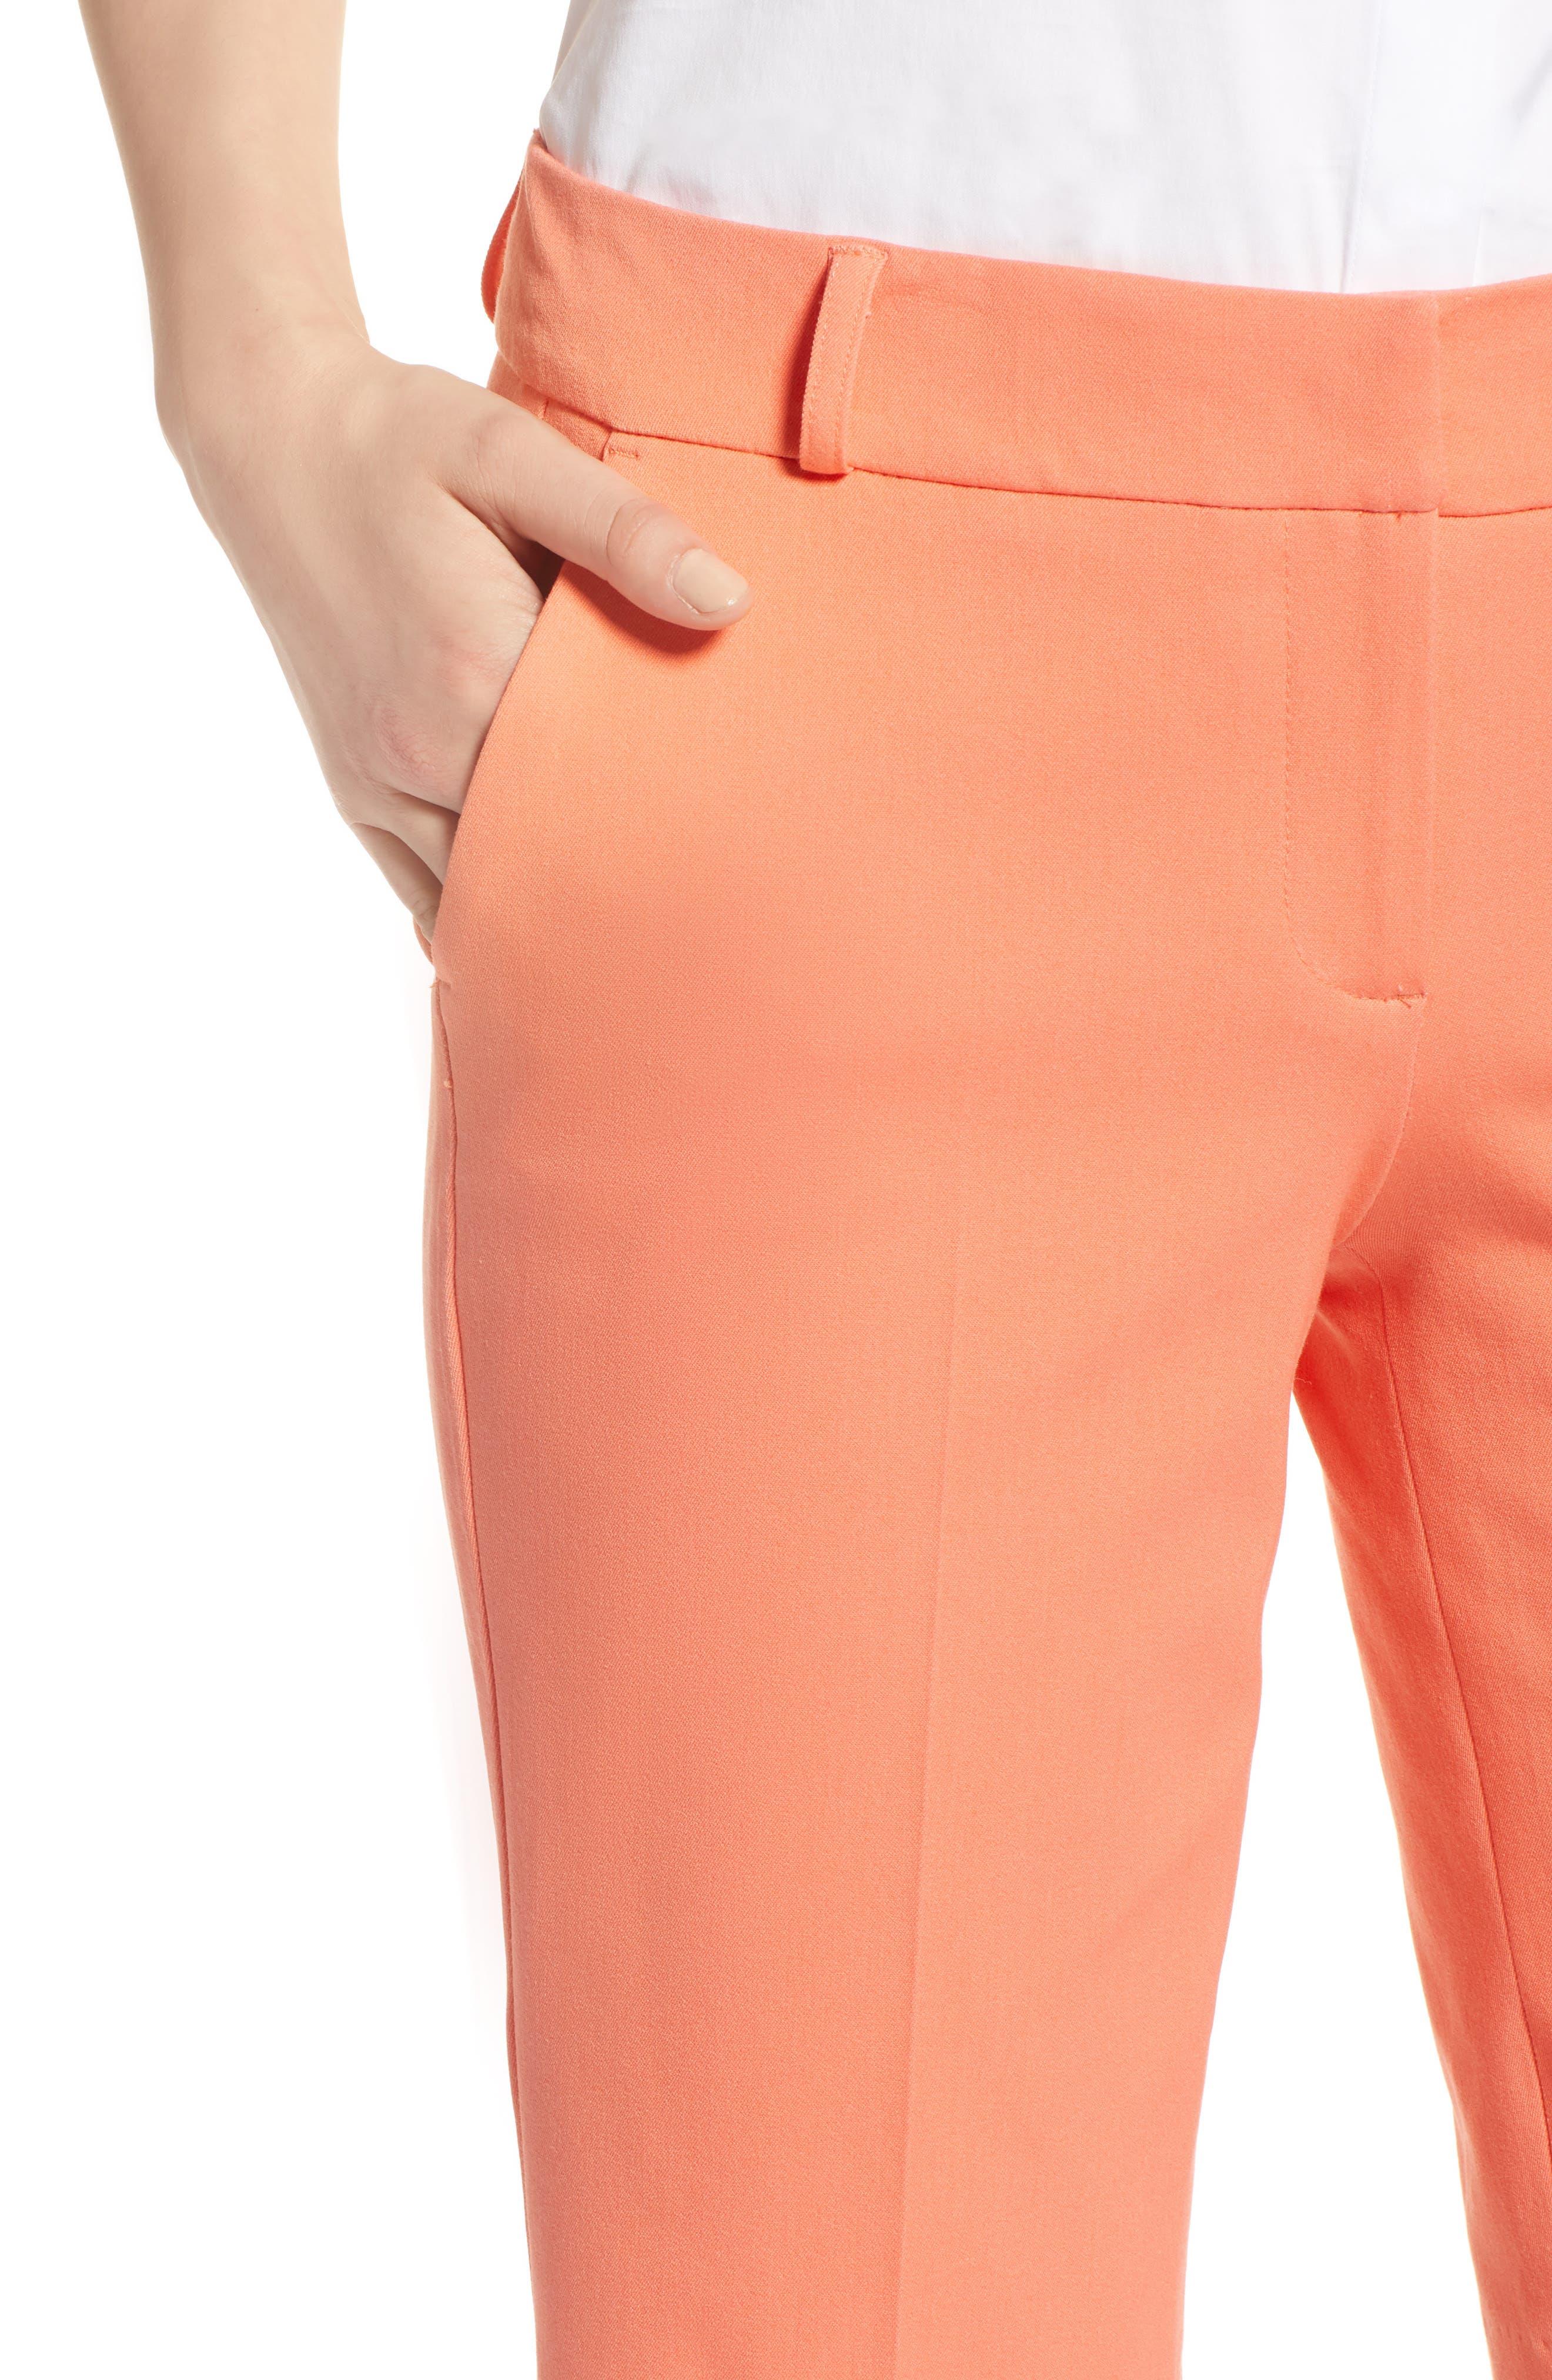 Stretch Bermuda Shorts,                             Alternate thumbnail 31, color,